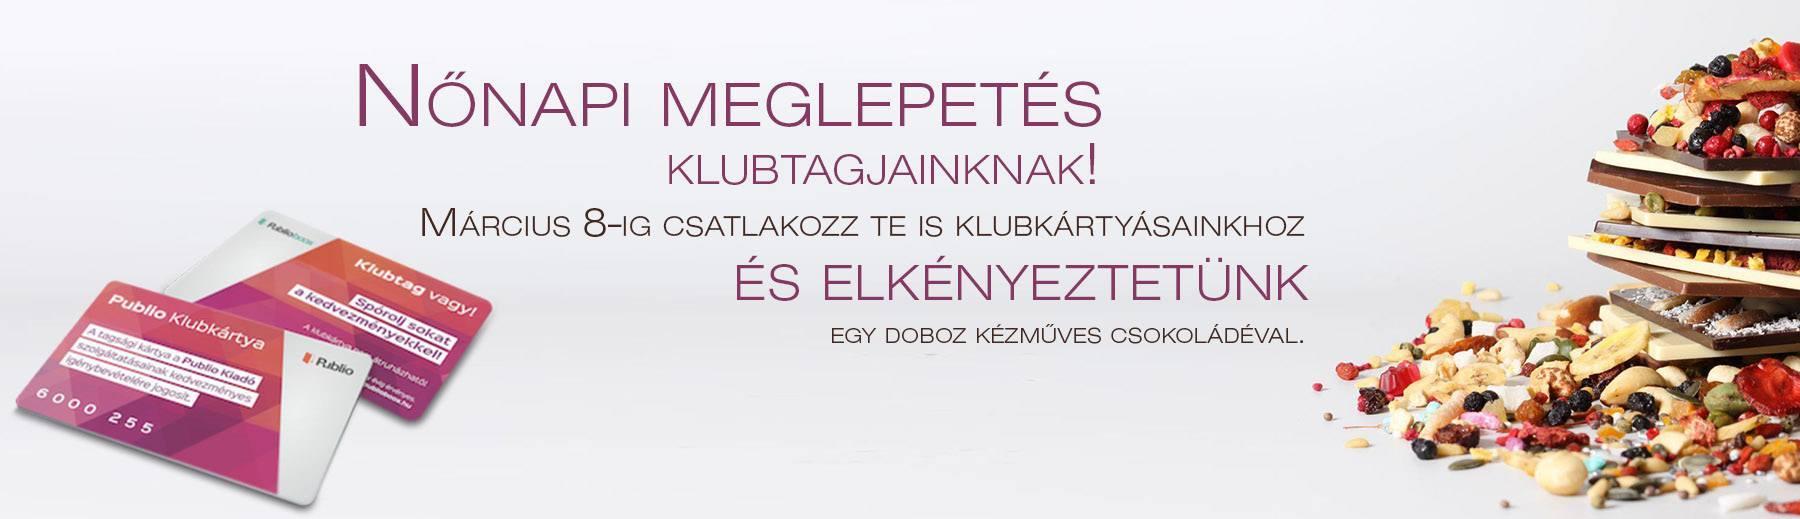 http://admin.konyvaruhaz.info/media/files/nonapi.jpg